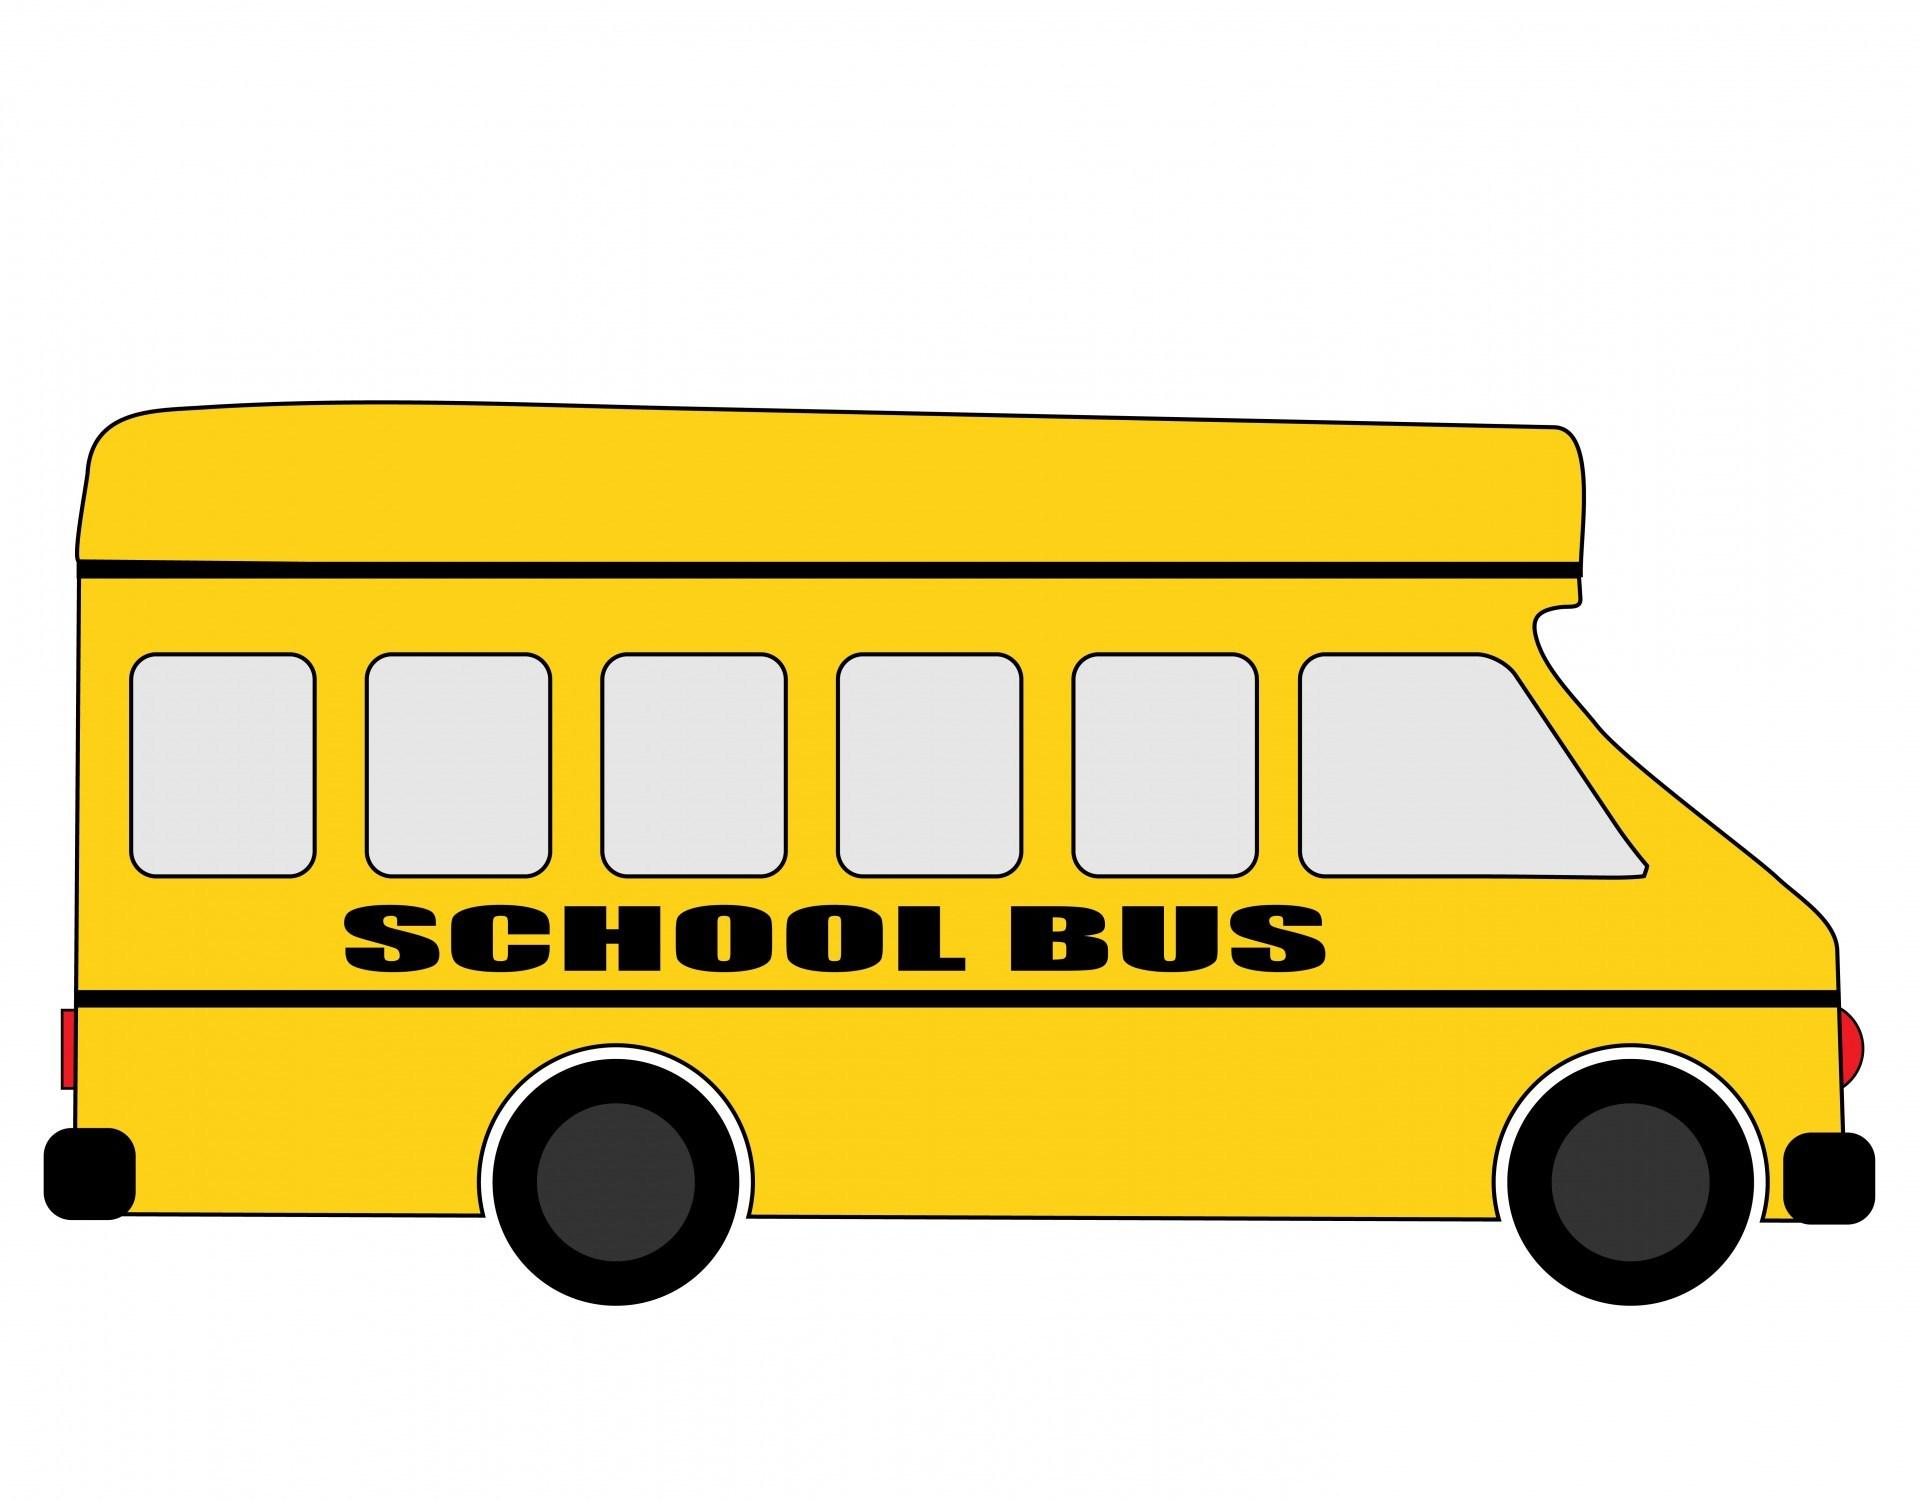 Free school bus clipart images 4 » Clipart Portal.